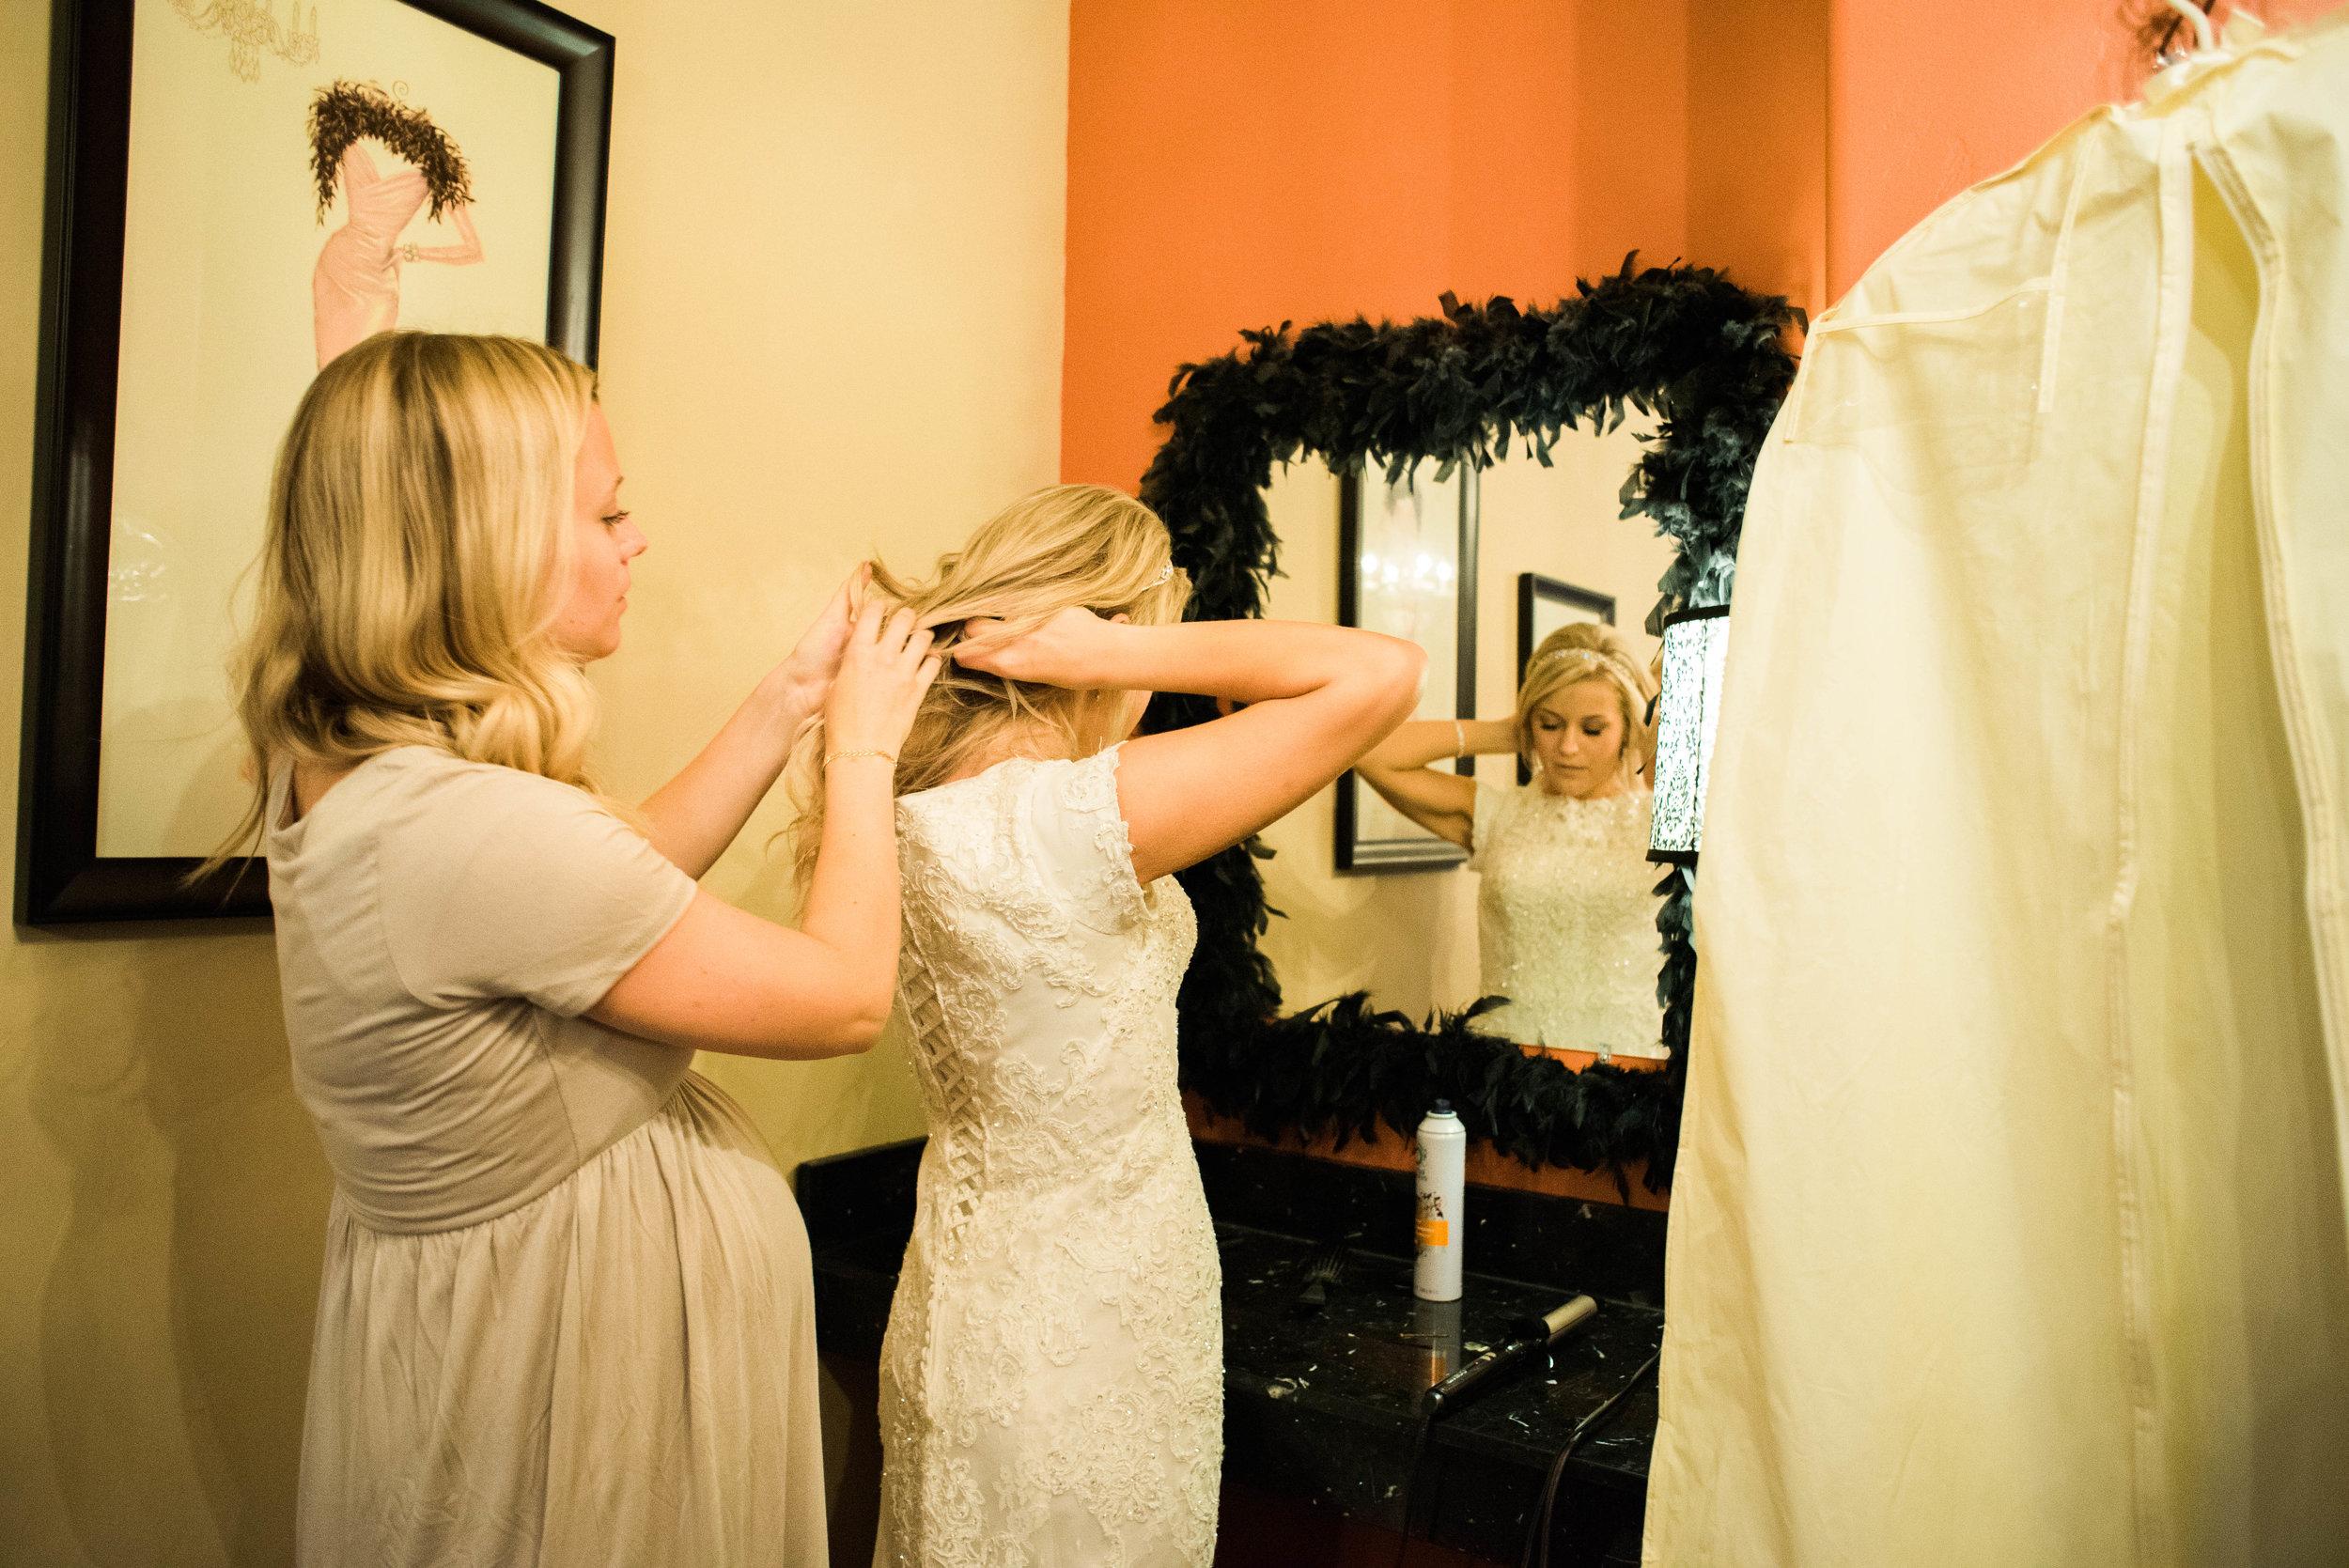 DANIEL+LACI-WEDDING-Sadie_Banks_Photography-91.jpg